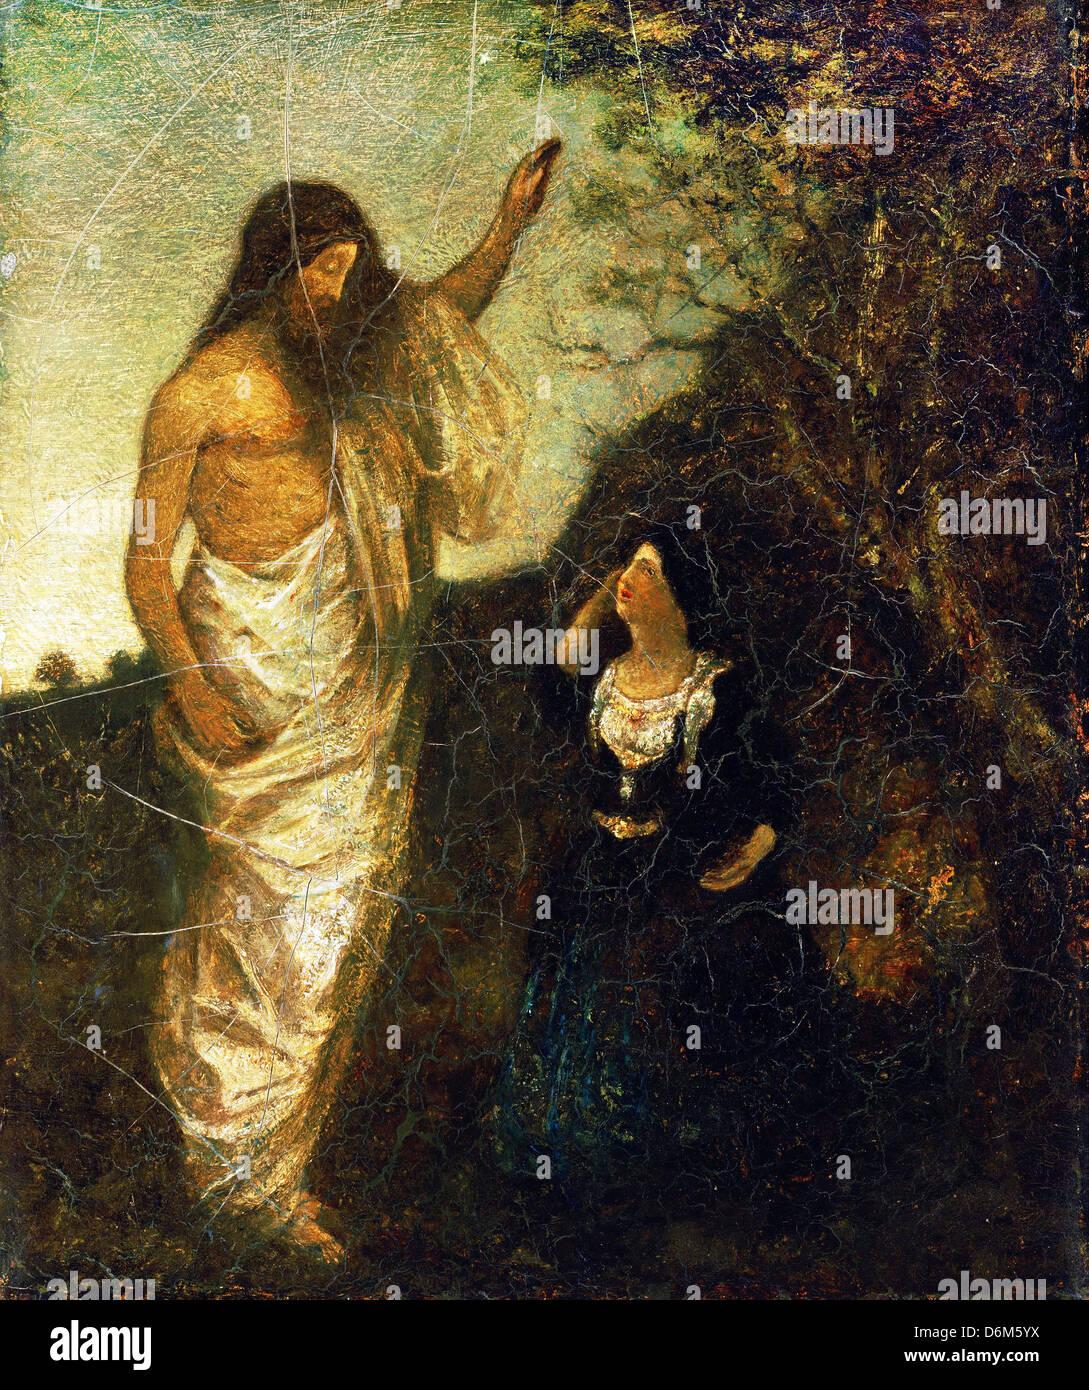 Albert Pinkham Ryder, Resurrection 1885 Oil on canvas. Phillips Collection, Washington, D.C., USA - Stock Image